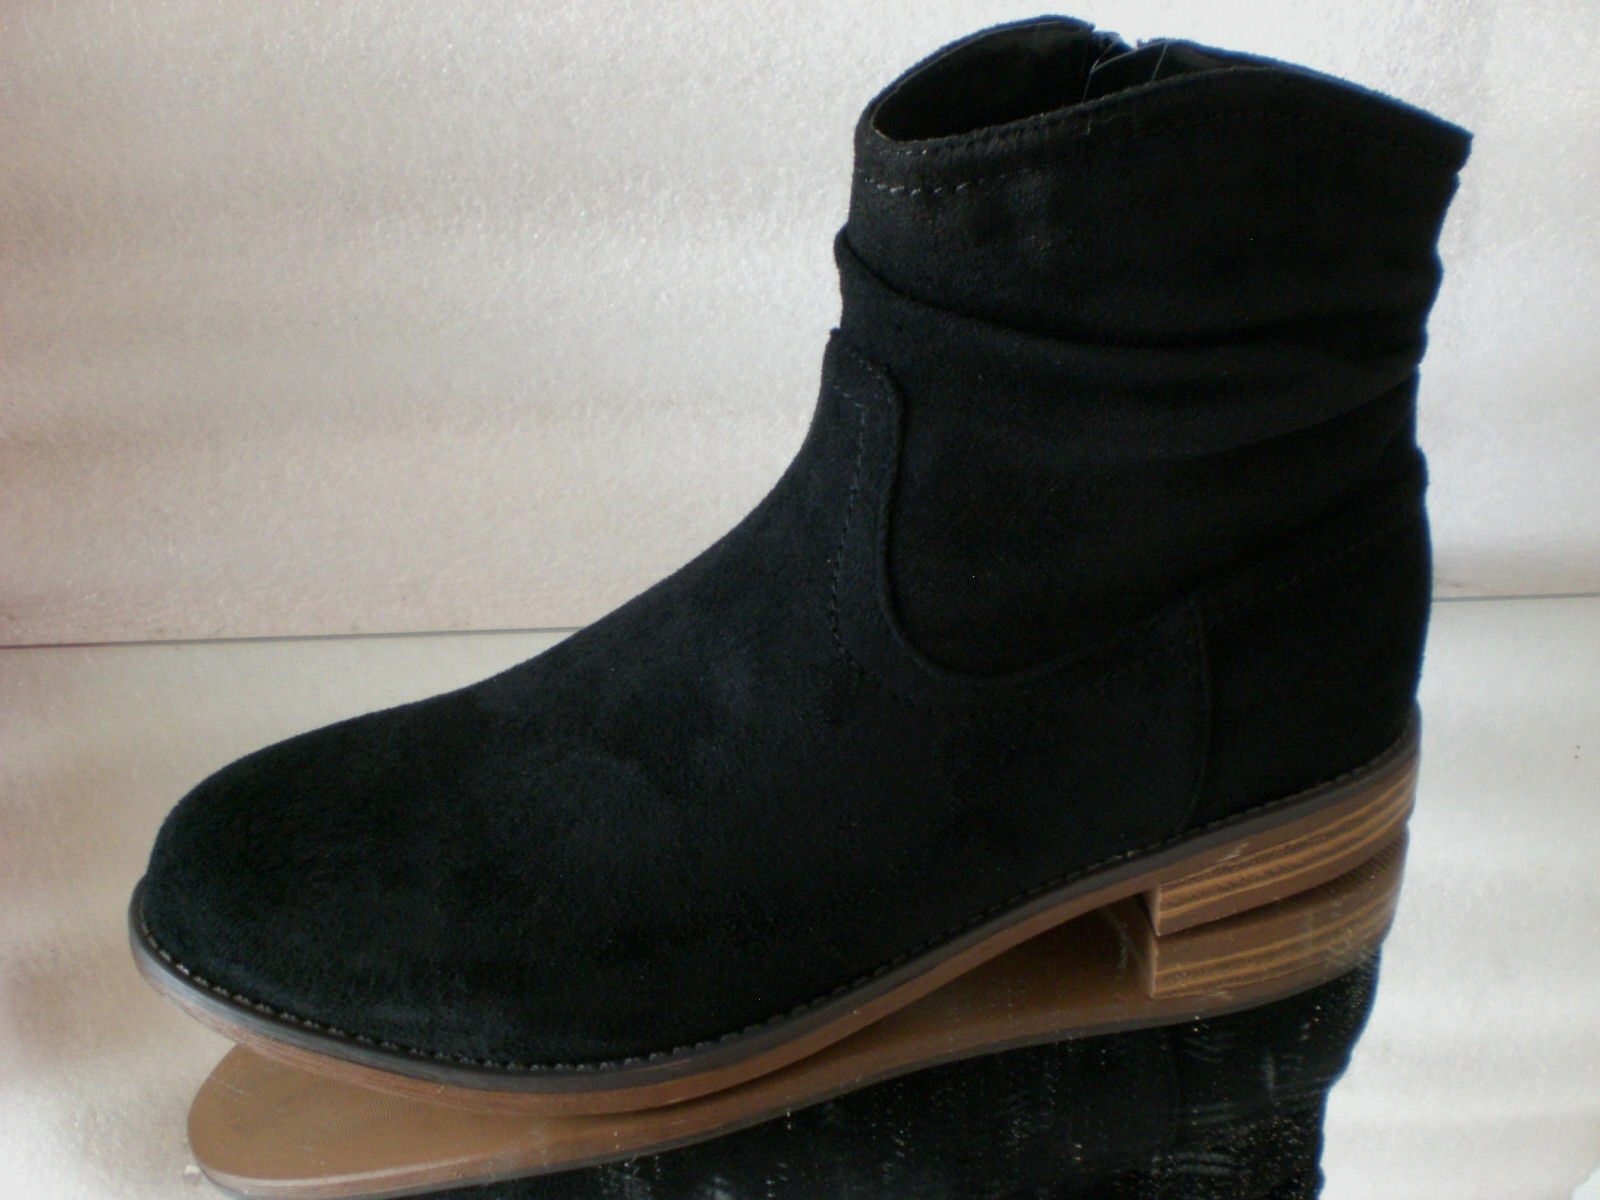 Another pair of Shoes alicee 1 señora caña corta botas negro uk5 nuevo